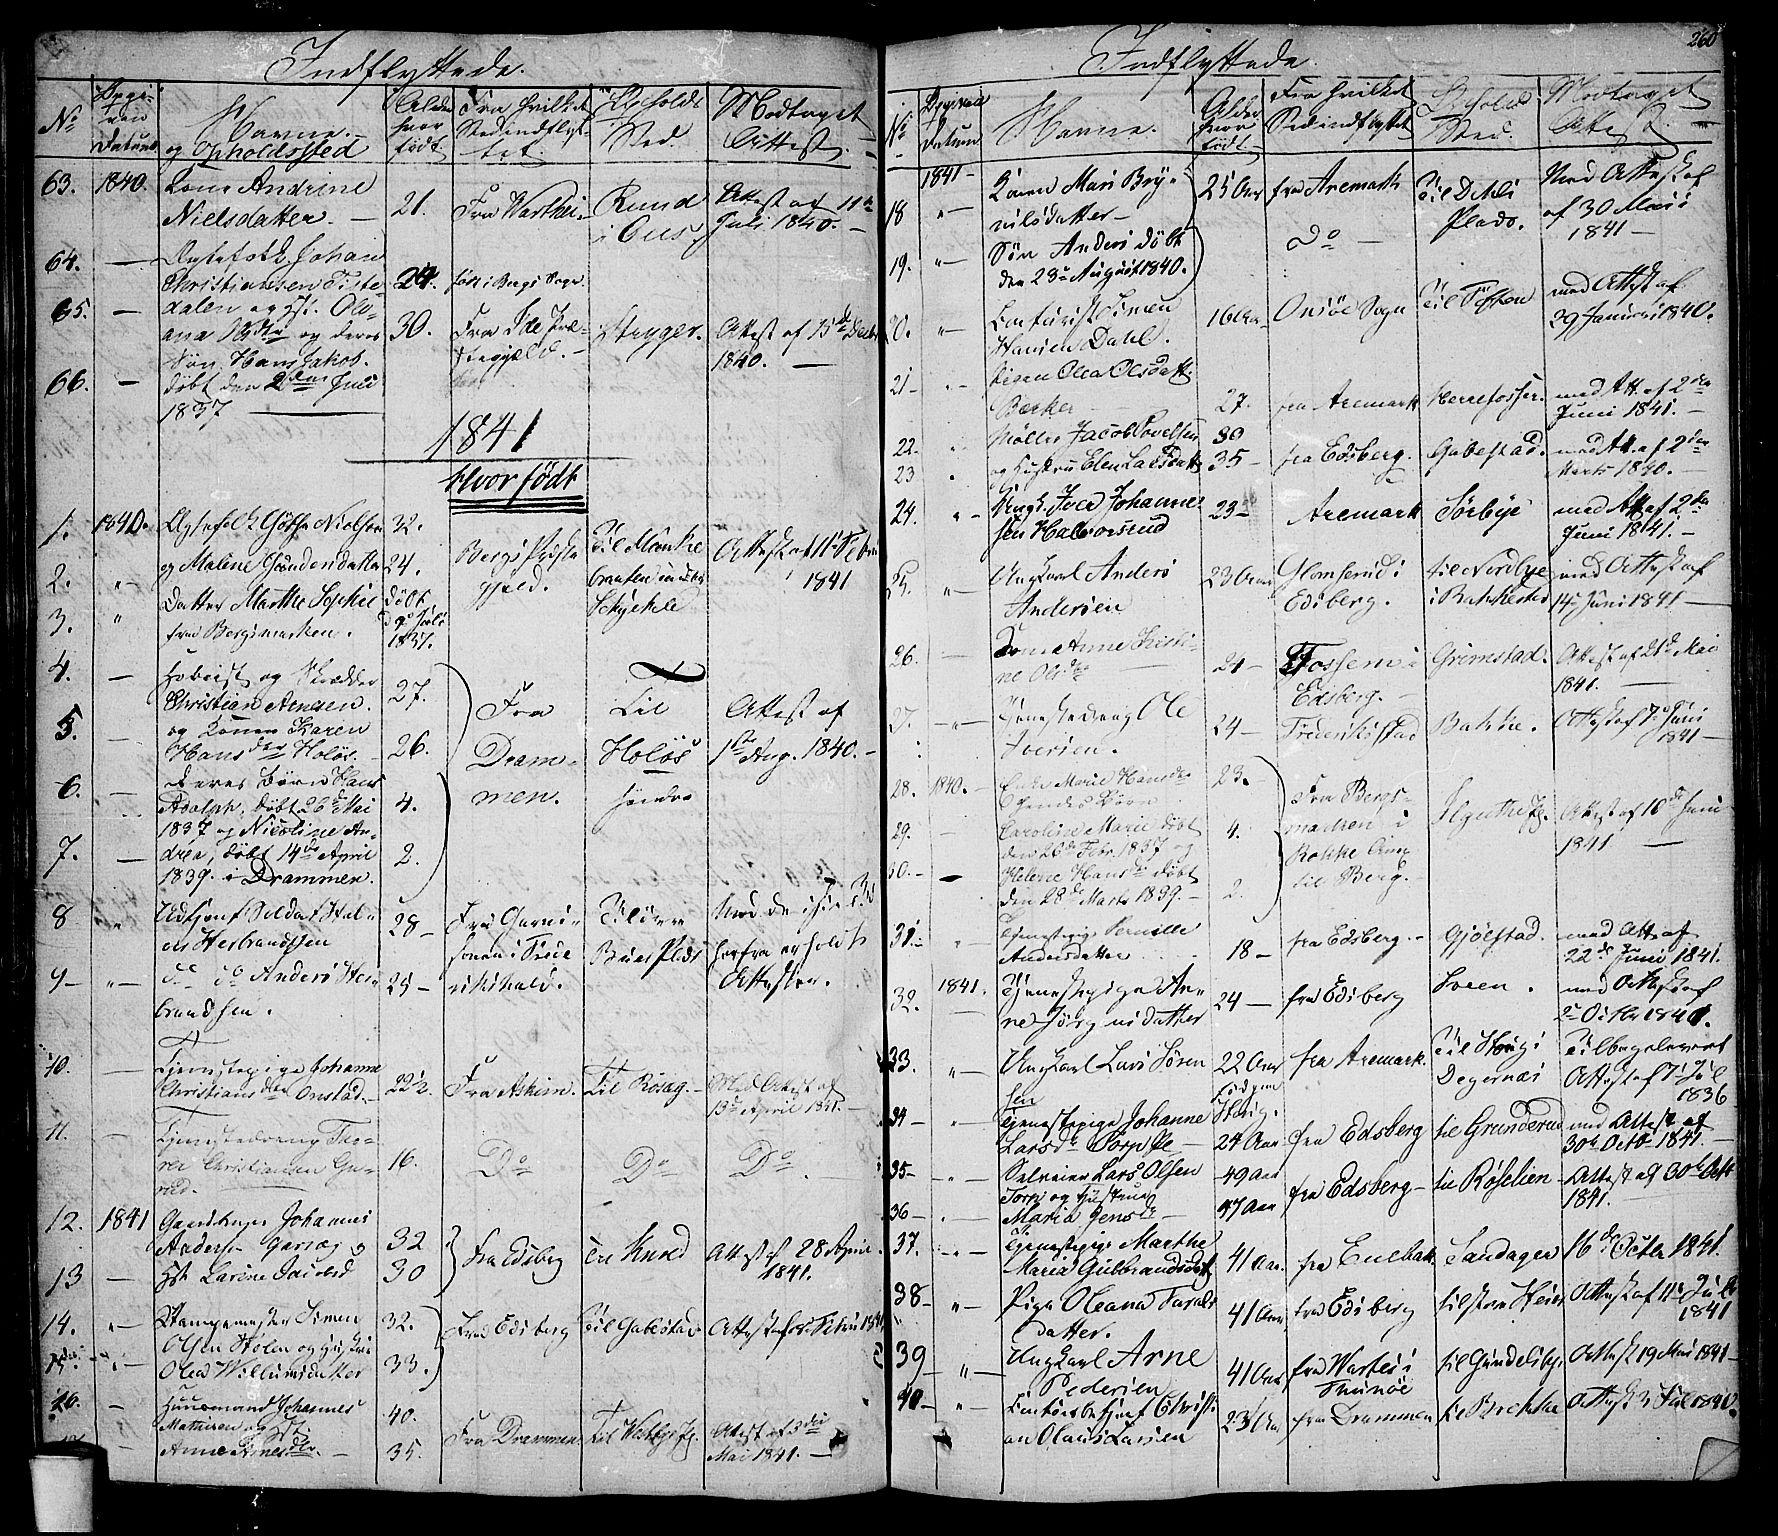 SAO, Rakkestad prestekontor Kirkebøker, F/Fa/L0007: Ministerialbok nr. I 7, 1825-1841, s. 260